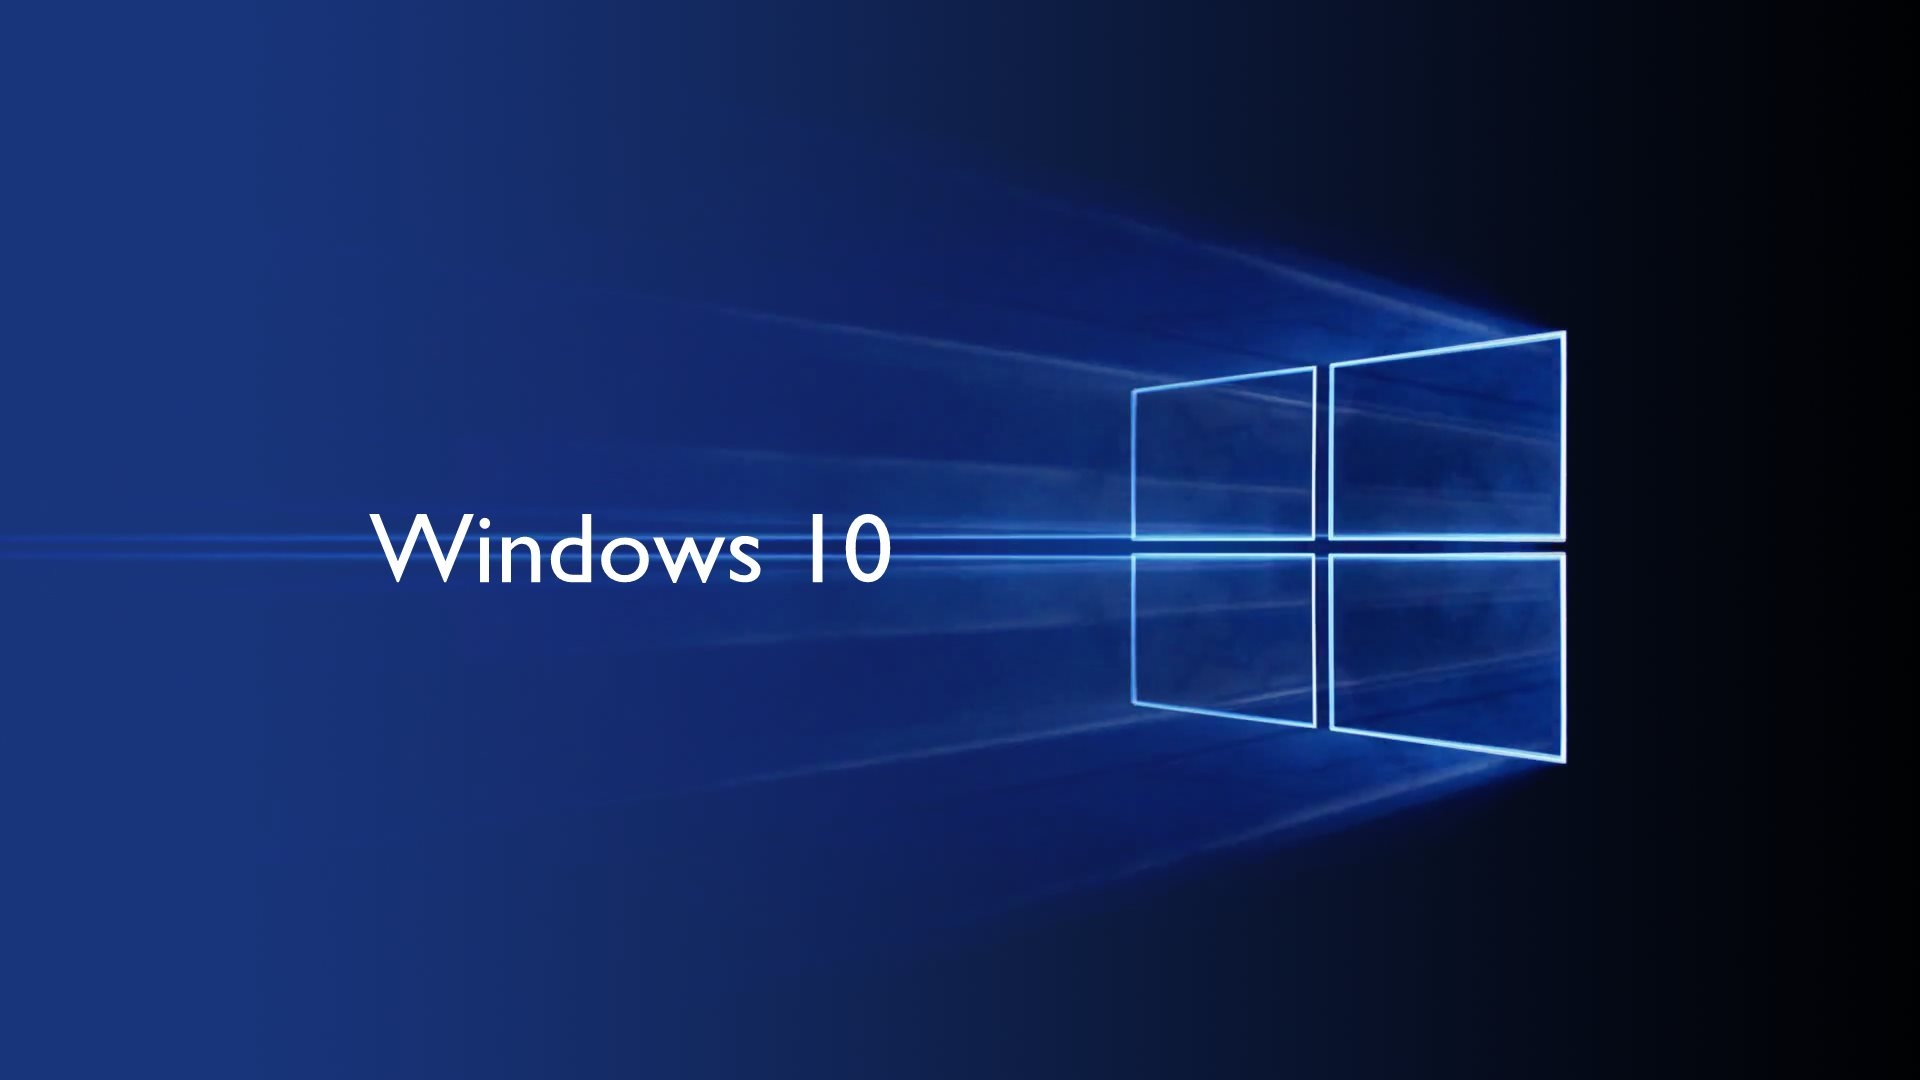 Ultimate Perfomance, Windows 10, Windows 10